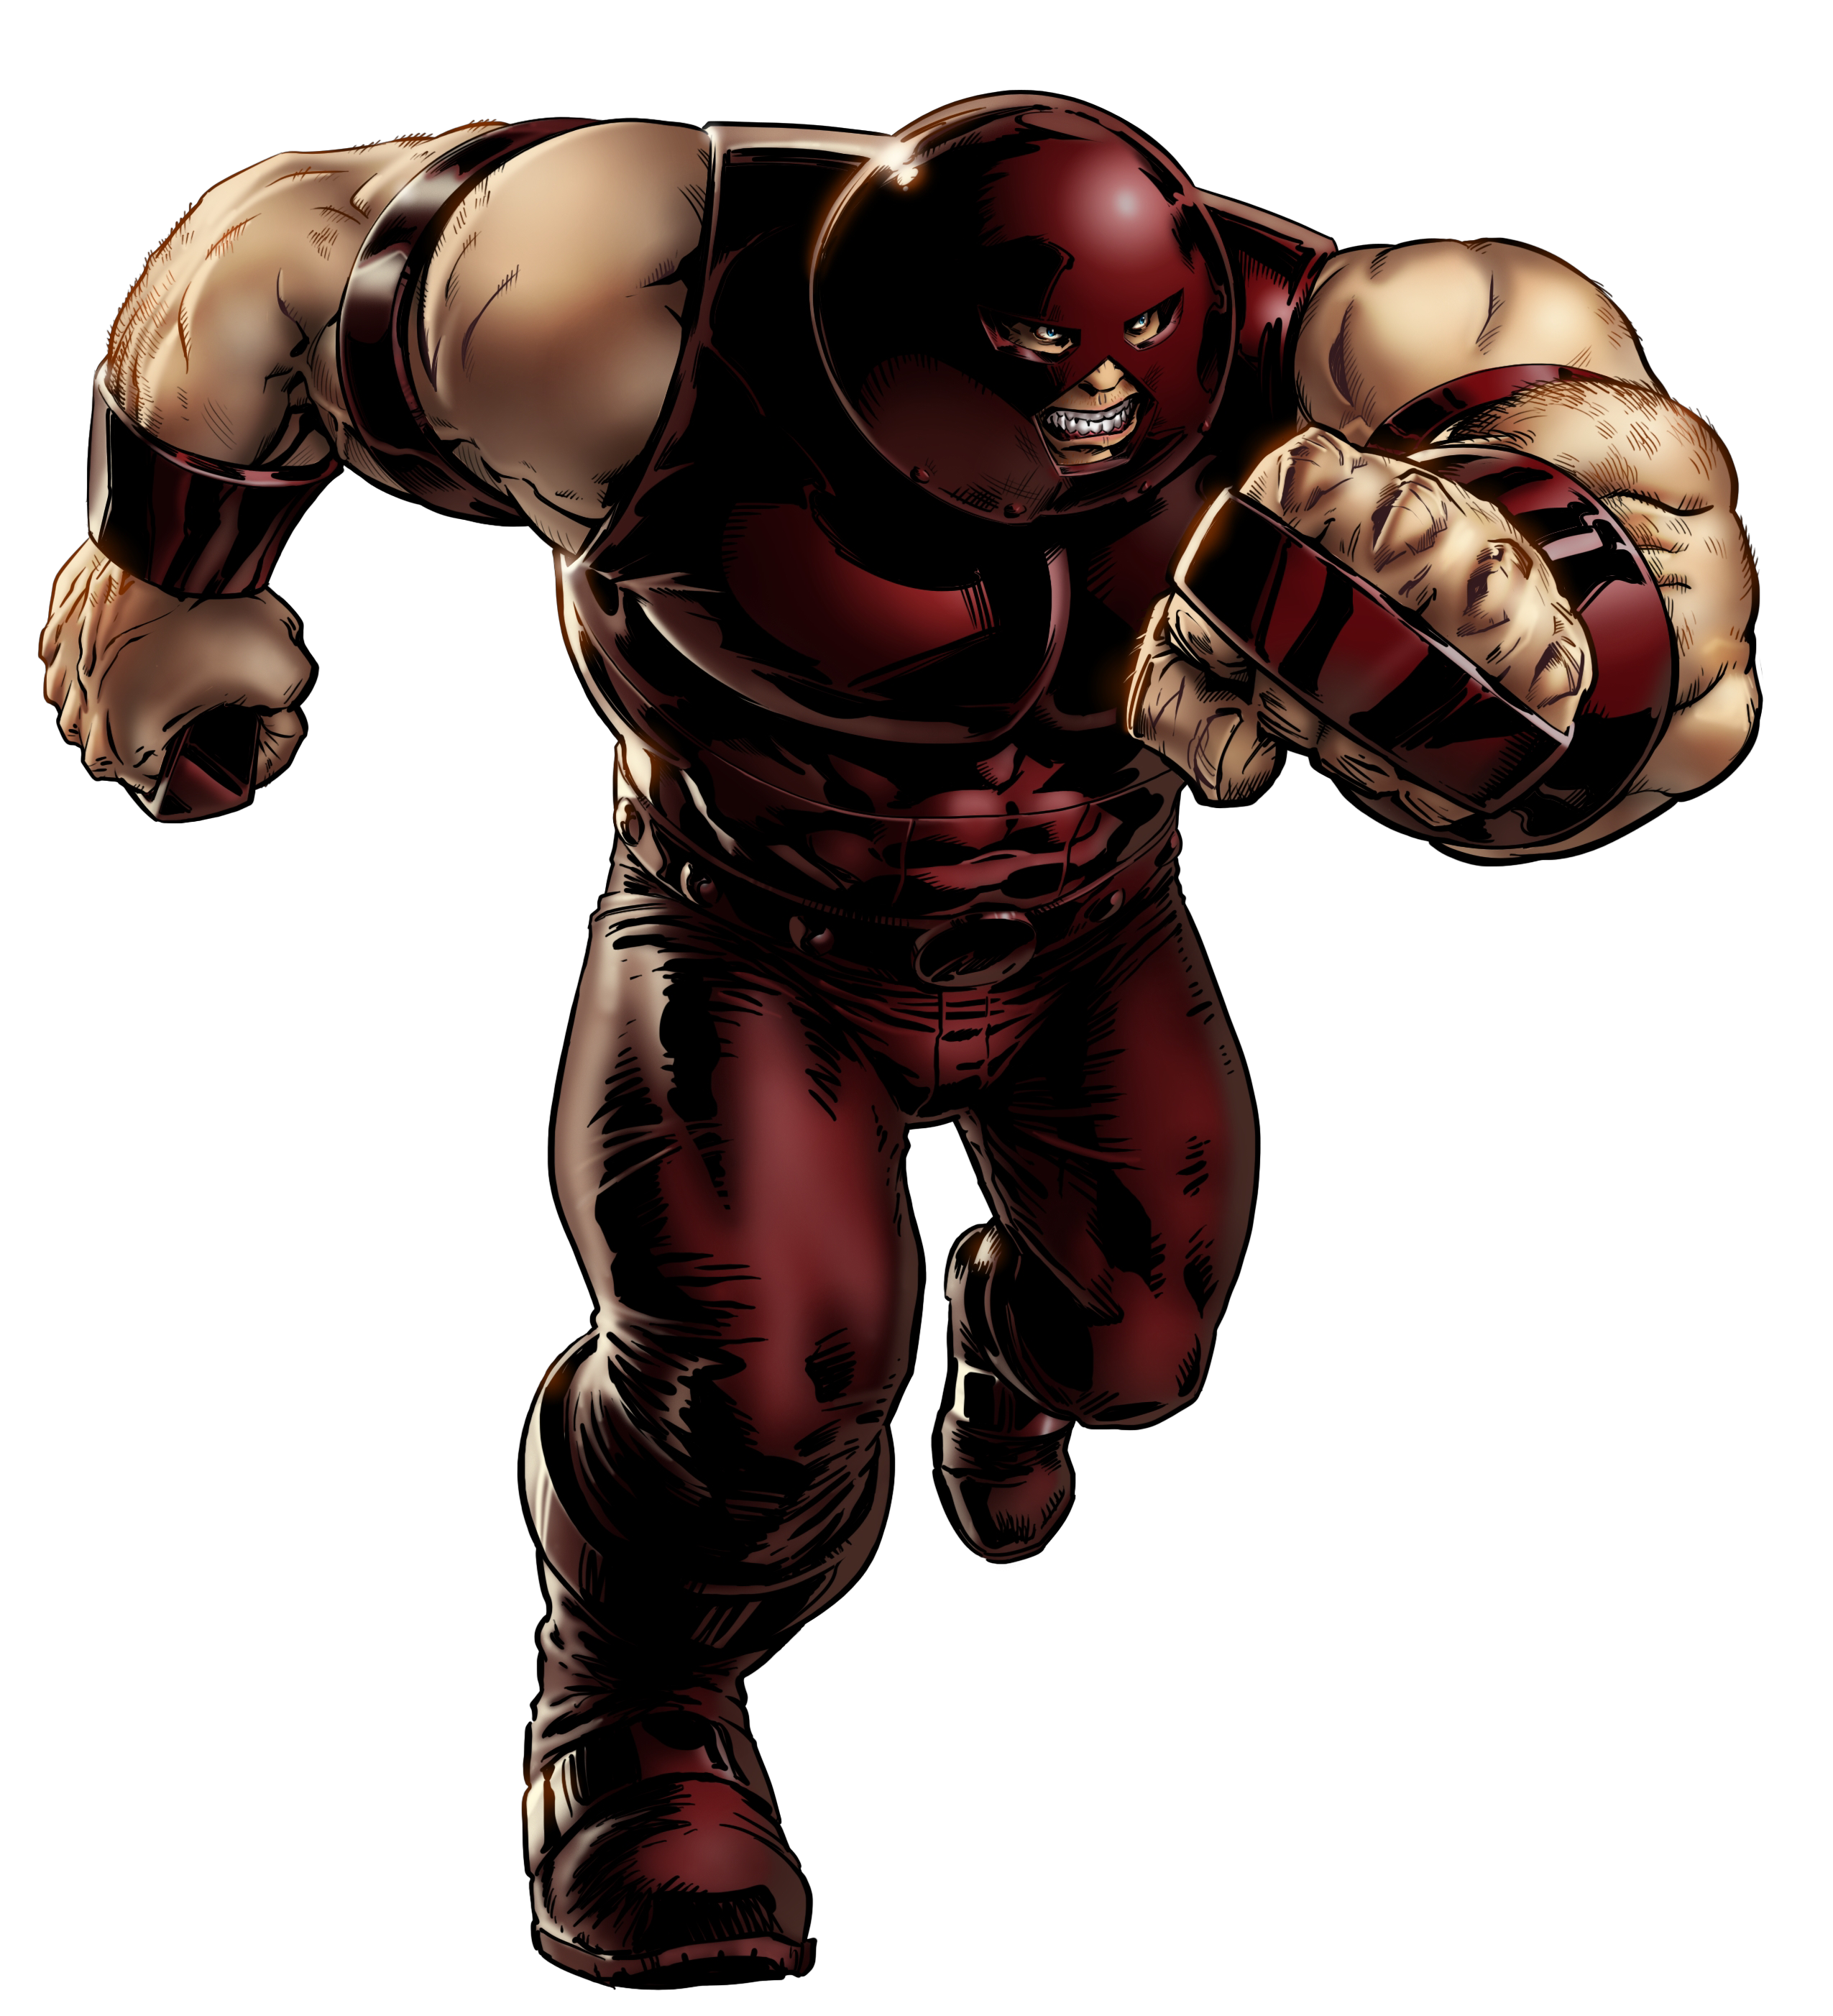 Great Wallpaper Marvel Juggernaut - 2abdd4a3c670e2418736505af6704041  Image_11569.png